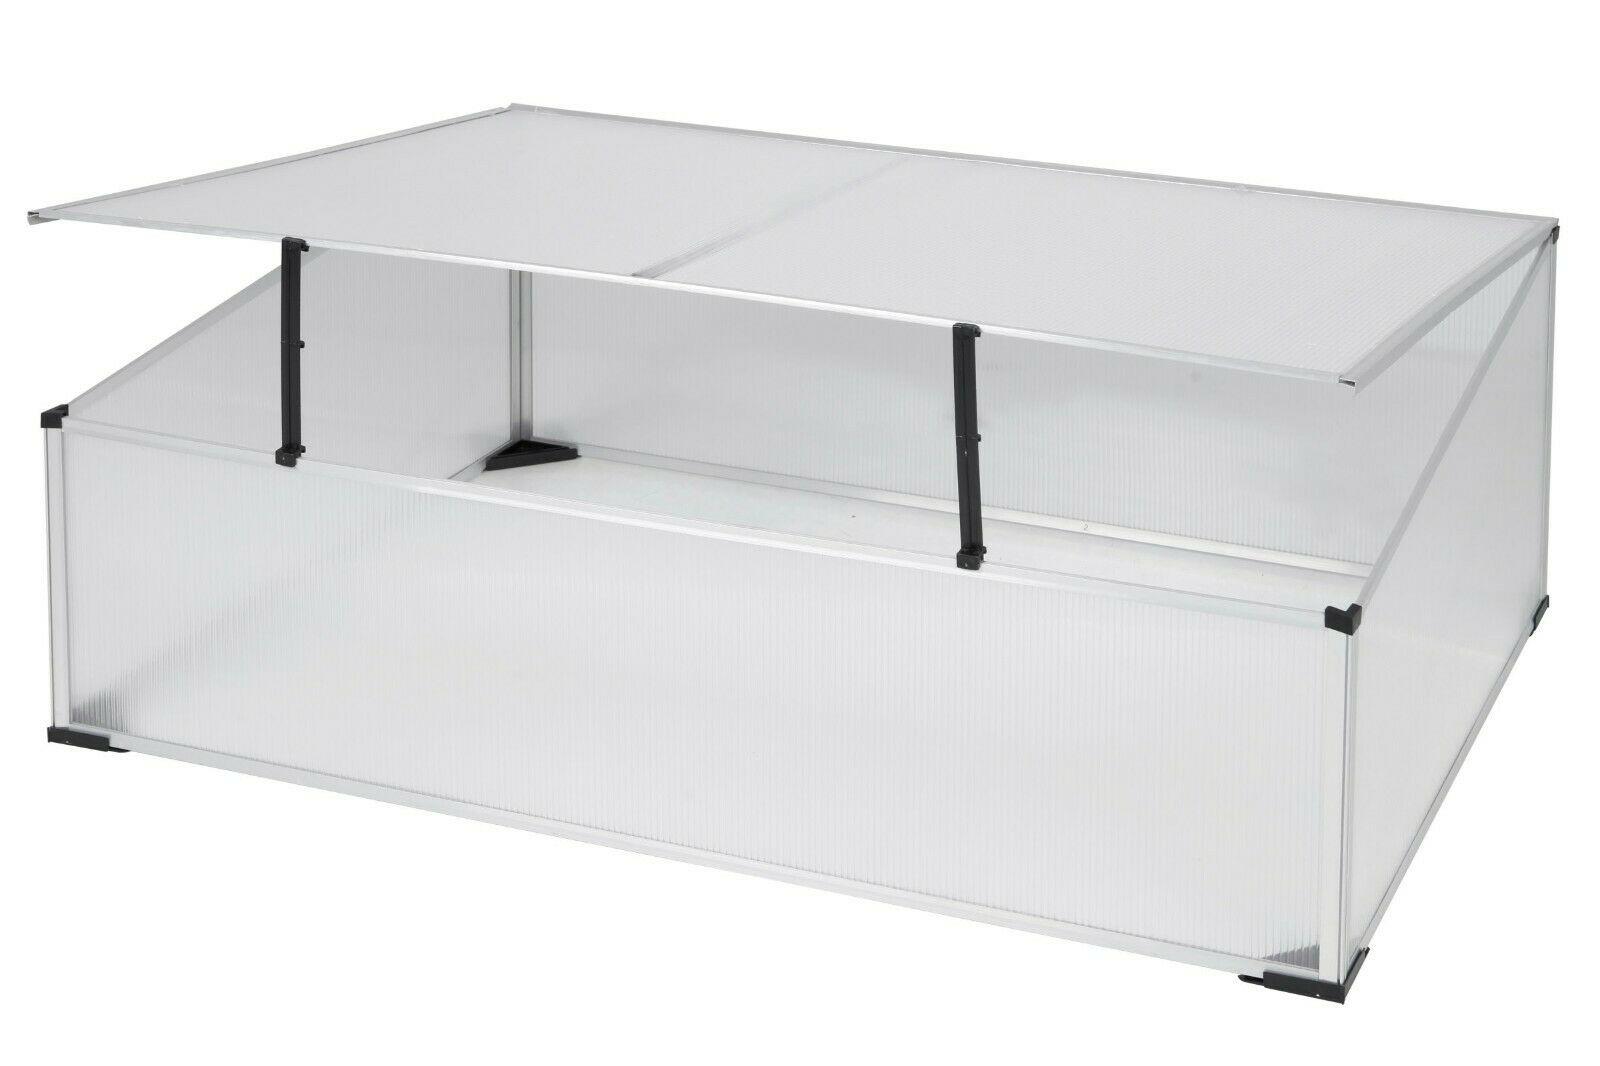 Linder Exclusiv Pařeniště MC4362 120x80x30/40 cm